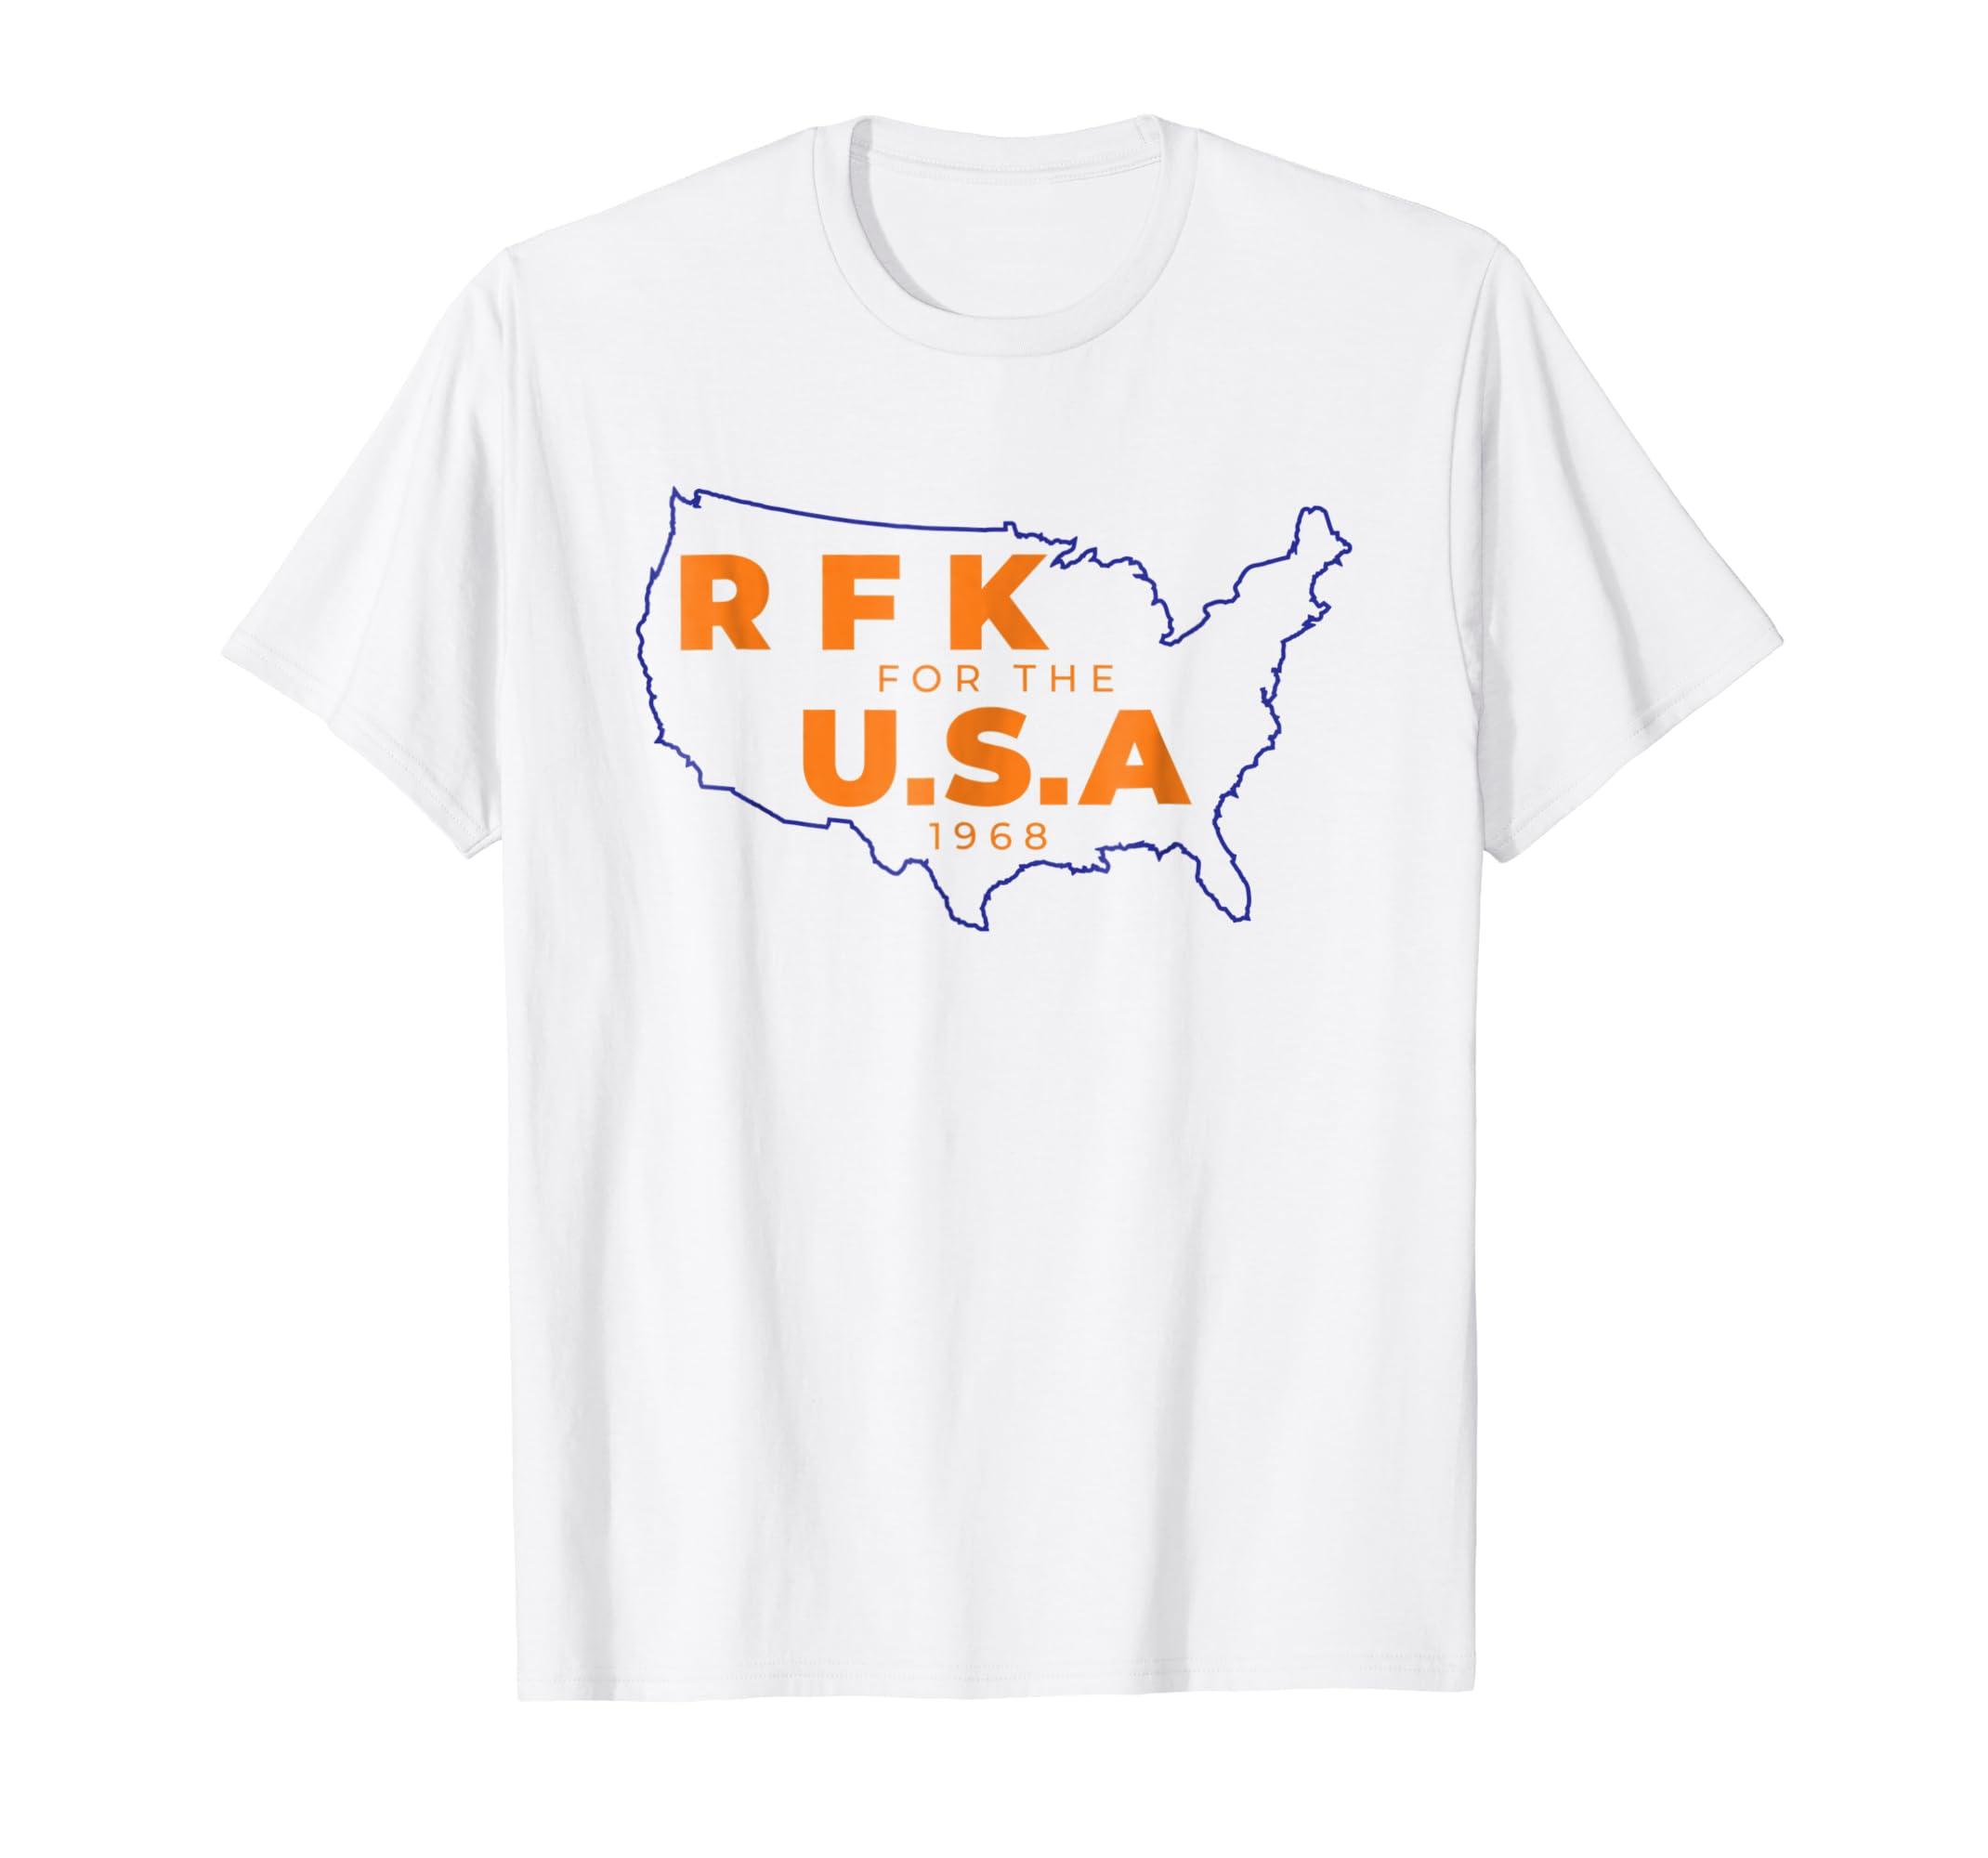 e2f42f90 Amazon.com: RFK Campaign Shirt Robert F Bobby Kennedy T-Shirt: Clothing